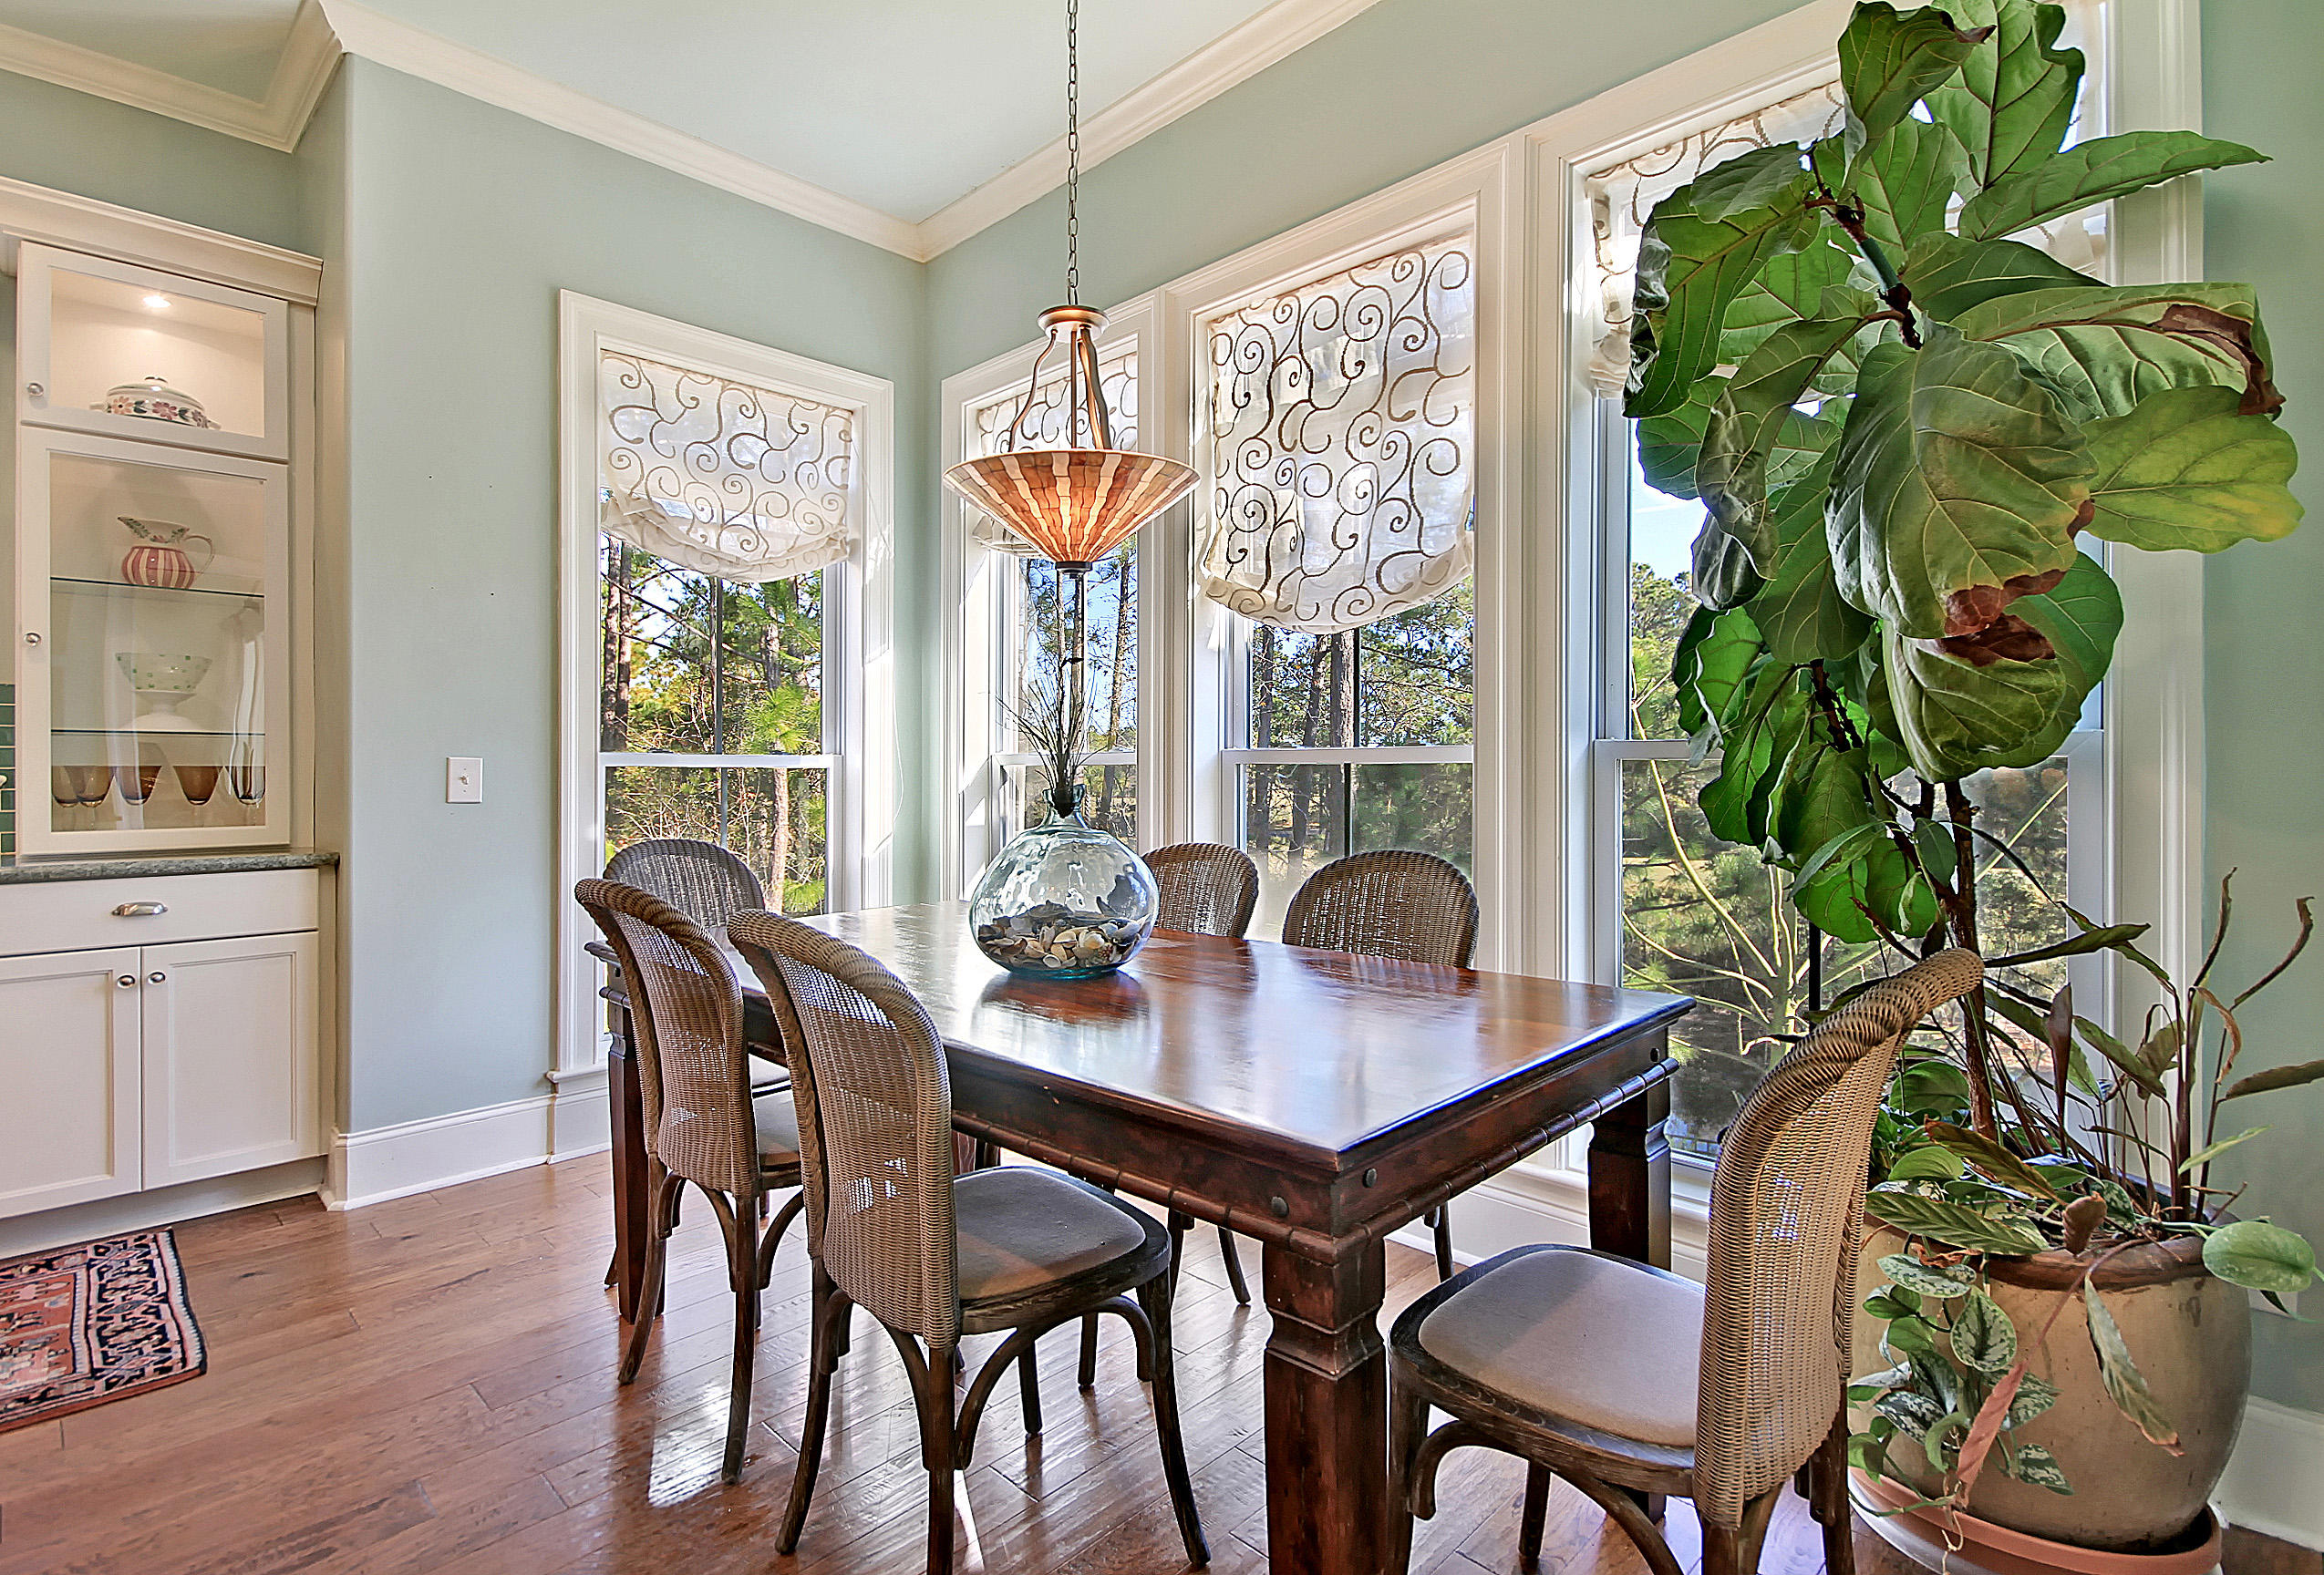 Rivertowne Country Club Homes For Sale - 2601 Kiln Creek, Mount Pleasant, SC - 0